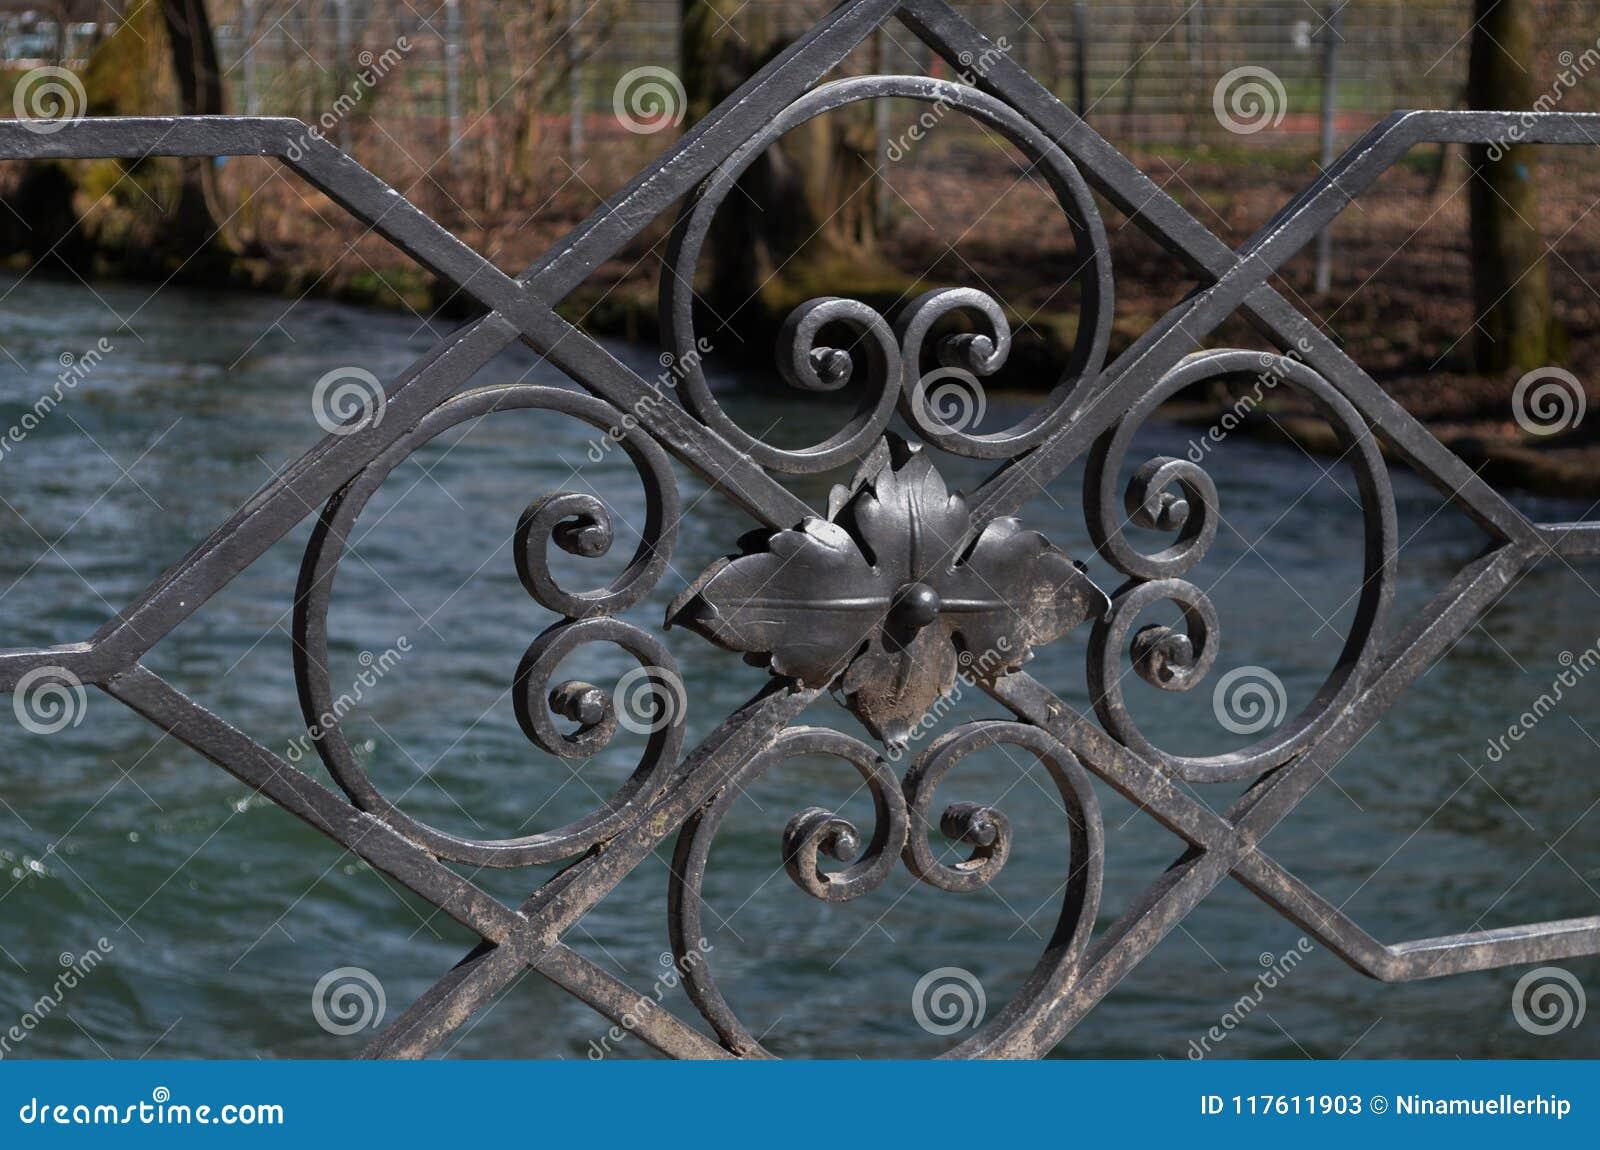 Close-up of the black iron ornaments of a bridge`s handrail